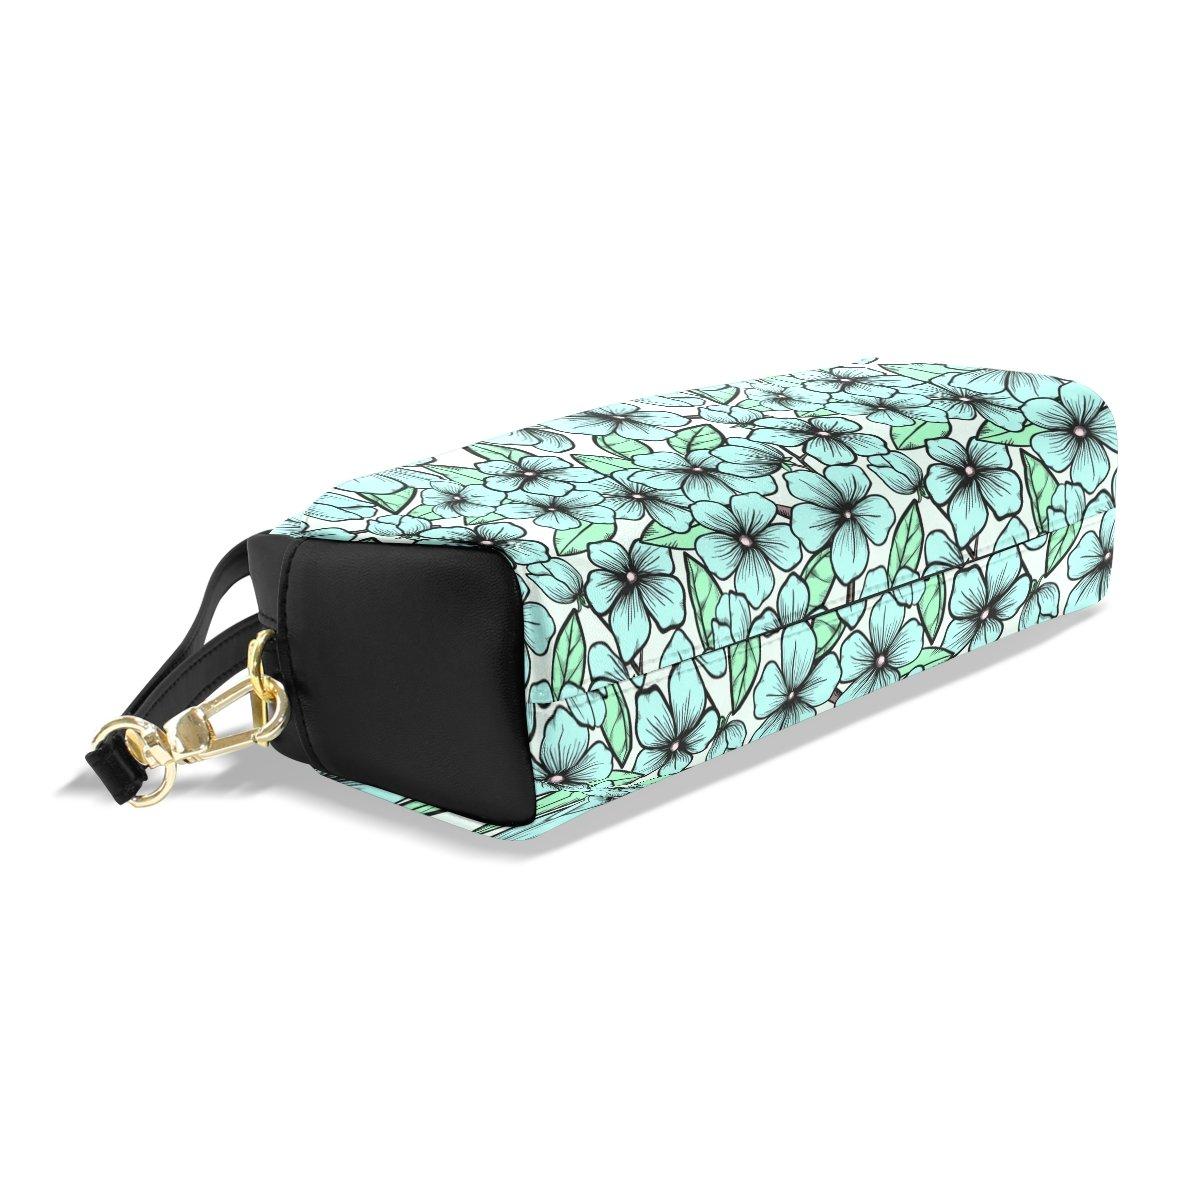 BENNIGIRY Schwarz Weiß Blossom Blossom Blossom Bleistift Fall tragbar Pen Tasche Student Schreibwaren Pouch PU Leder Groß Kapazität Reißverschluss Make-up Kosmetiktasche B07BF98NGY       Vorzugspreis  3ab21d